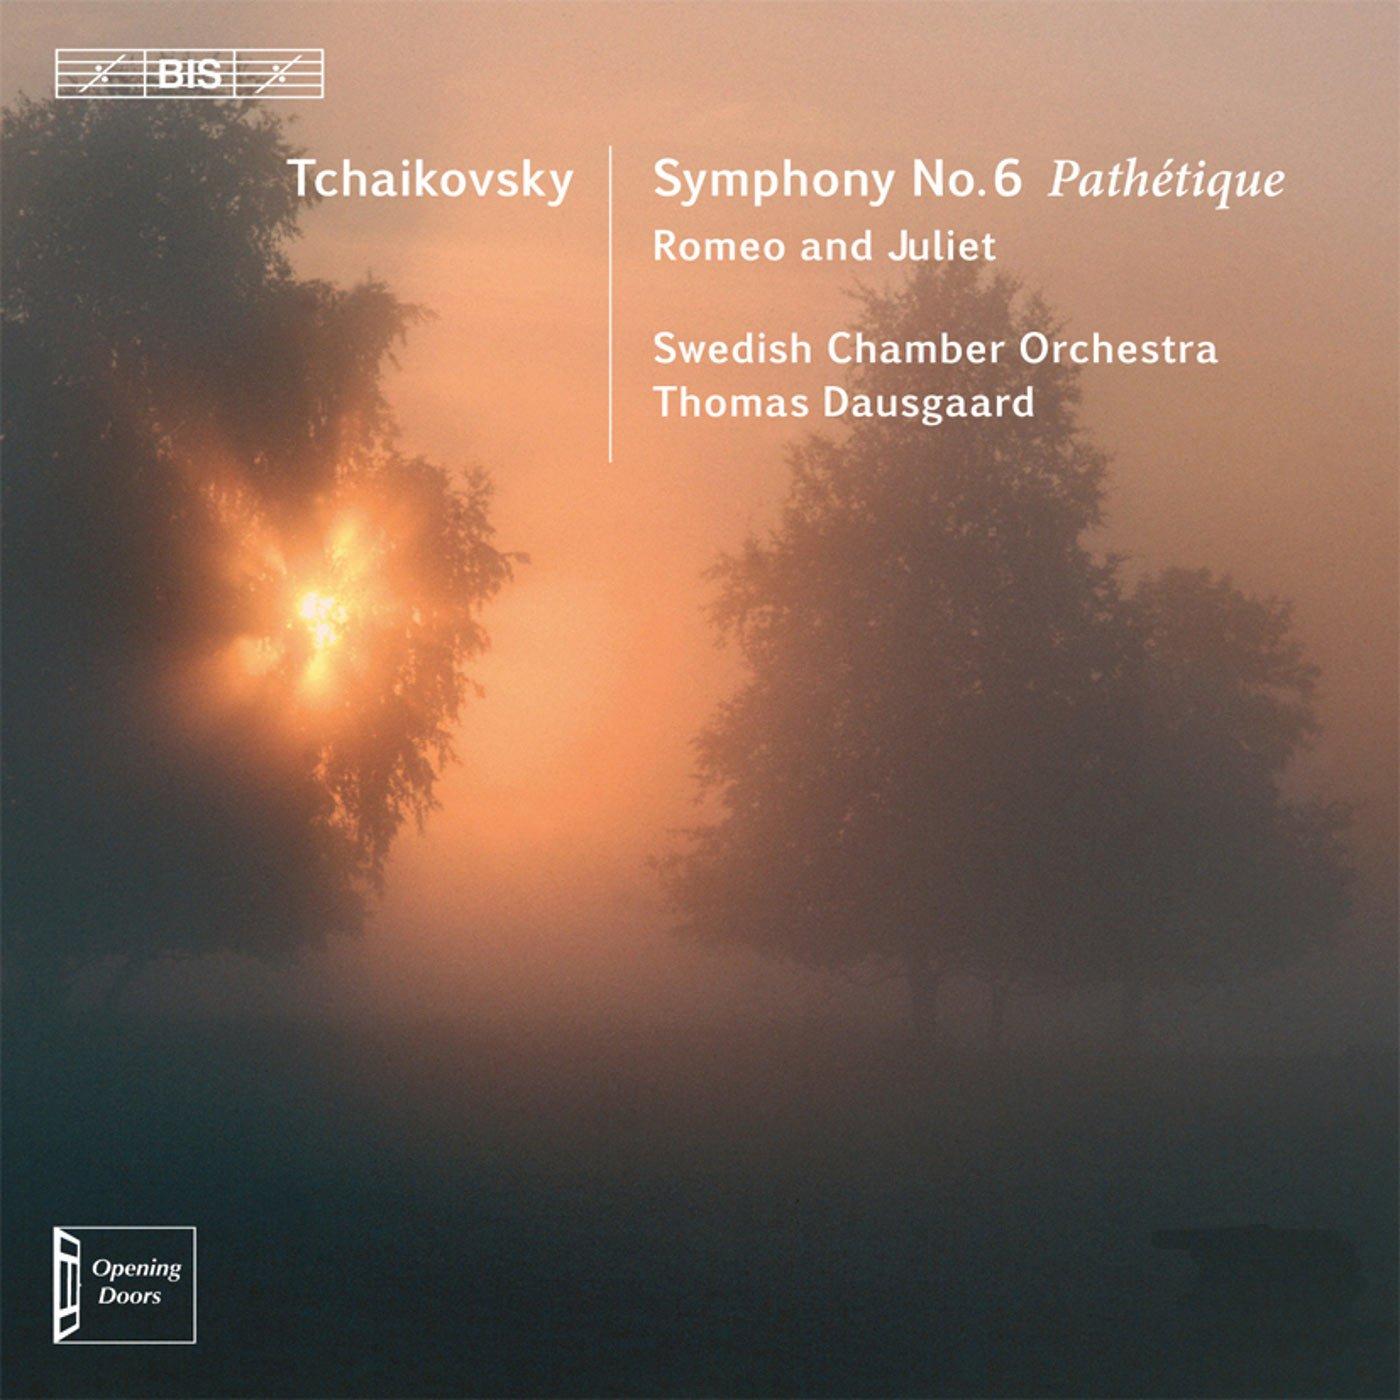 SACD : Thomas Dausgaard - Sym No 6 In B Minor / Pathetique Op 74 (Hybrid SACD)